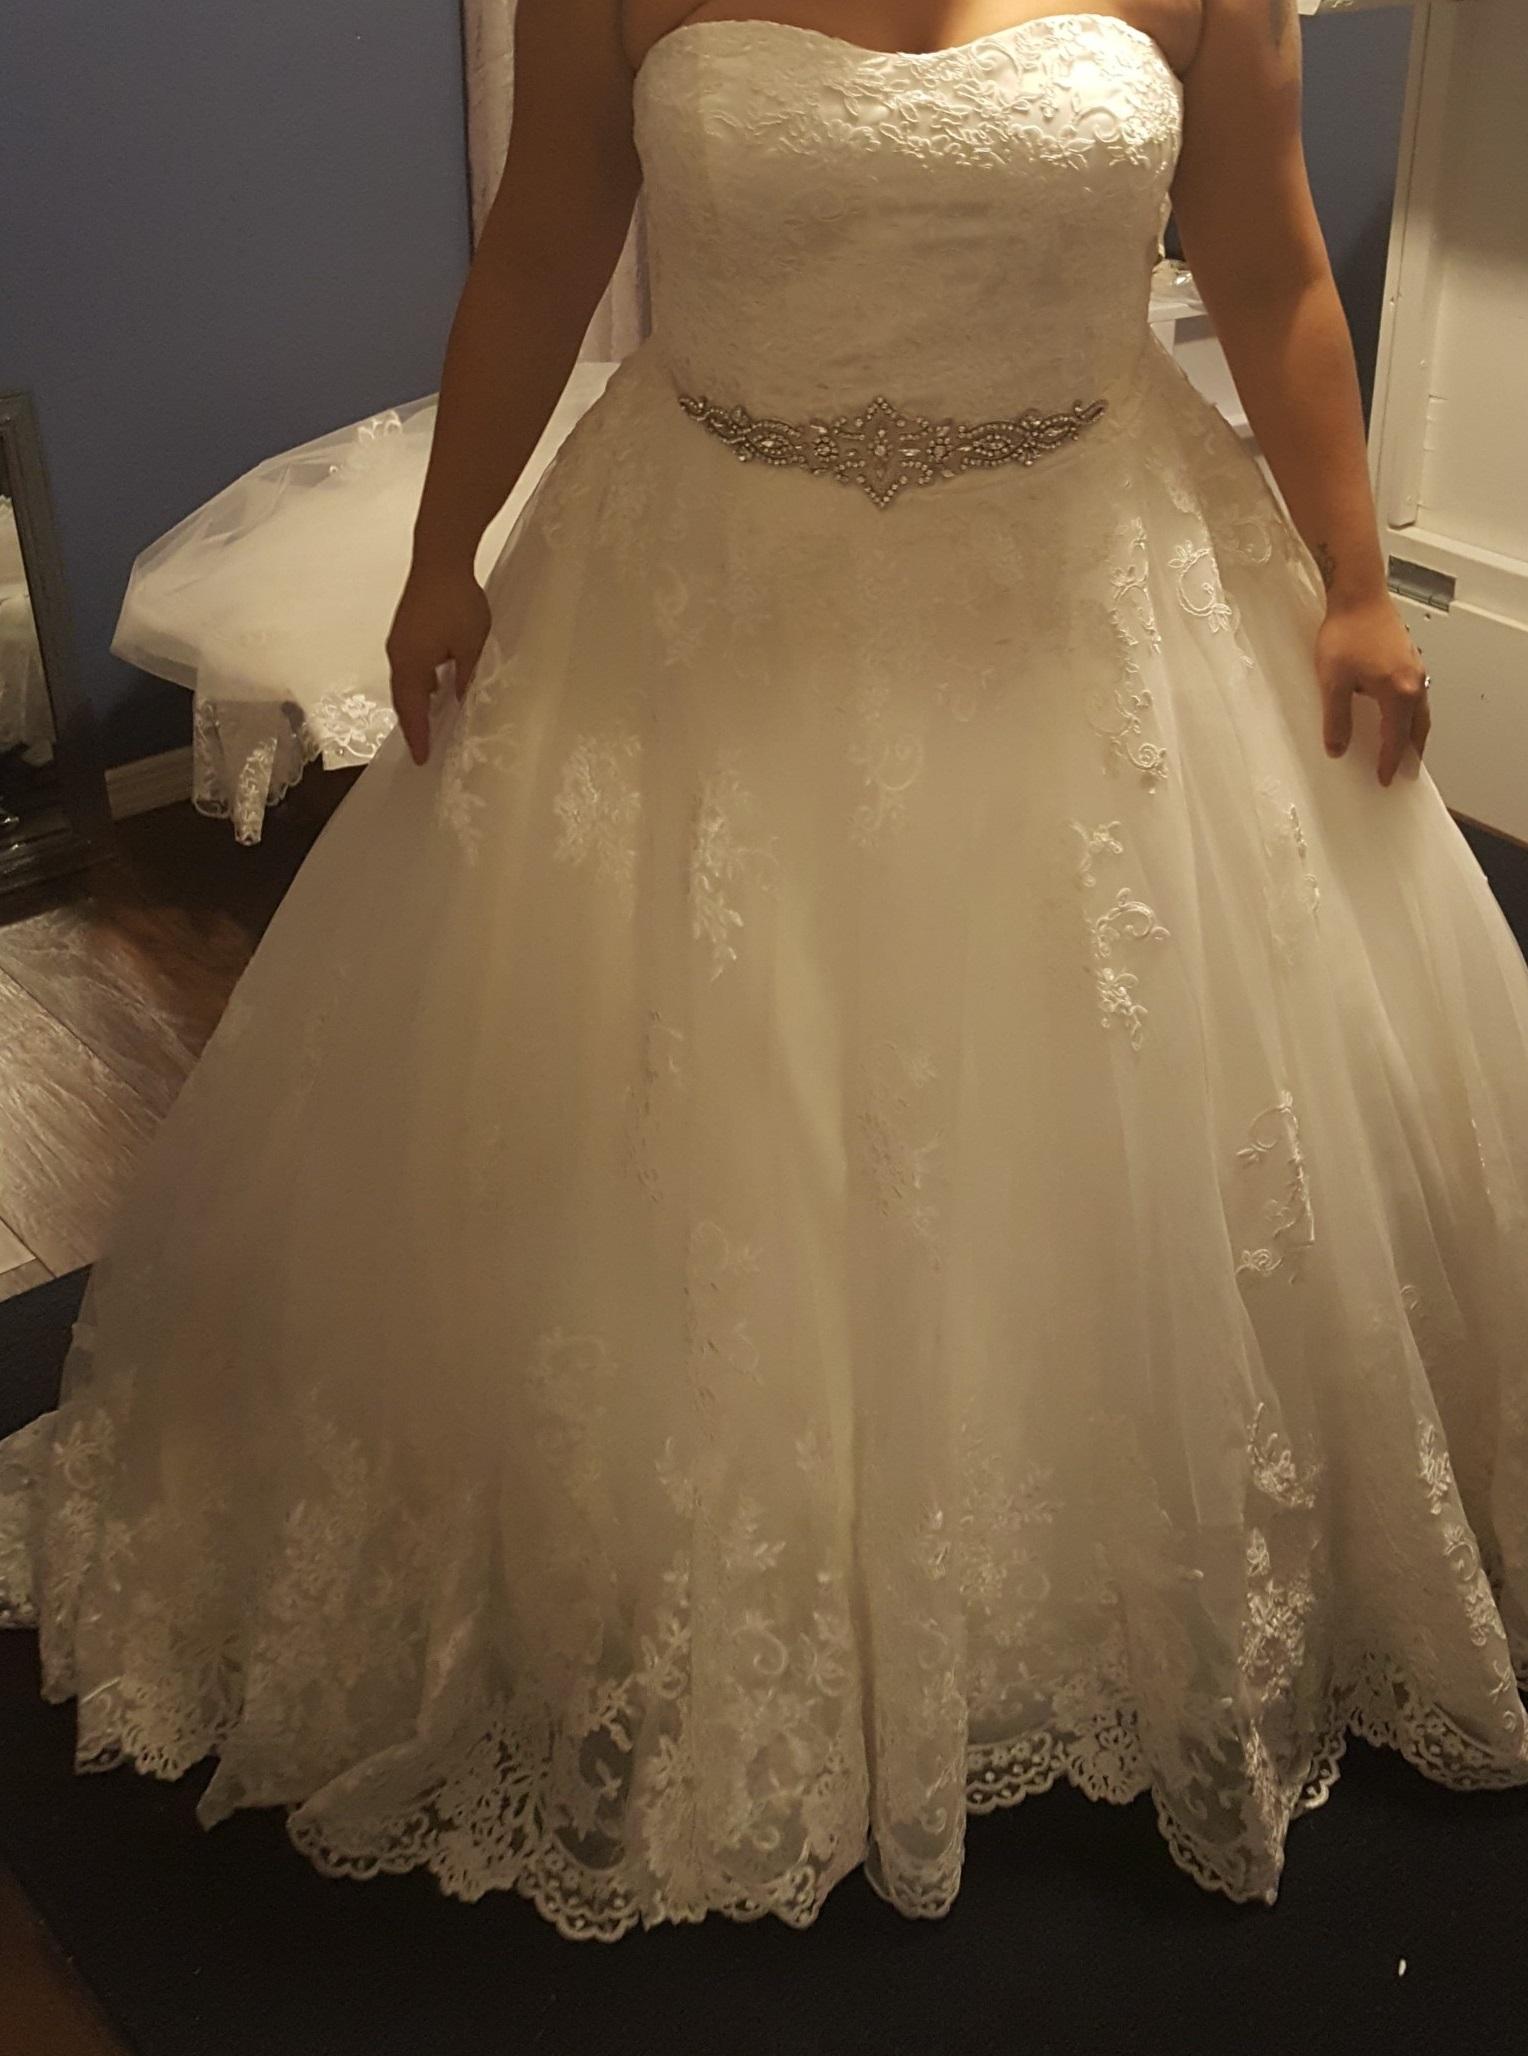 Ball Gown Sweetheart Court Train Tulle Lace Wedding Dress g jjshouse wedding dress pic1 jpeg